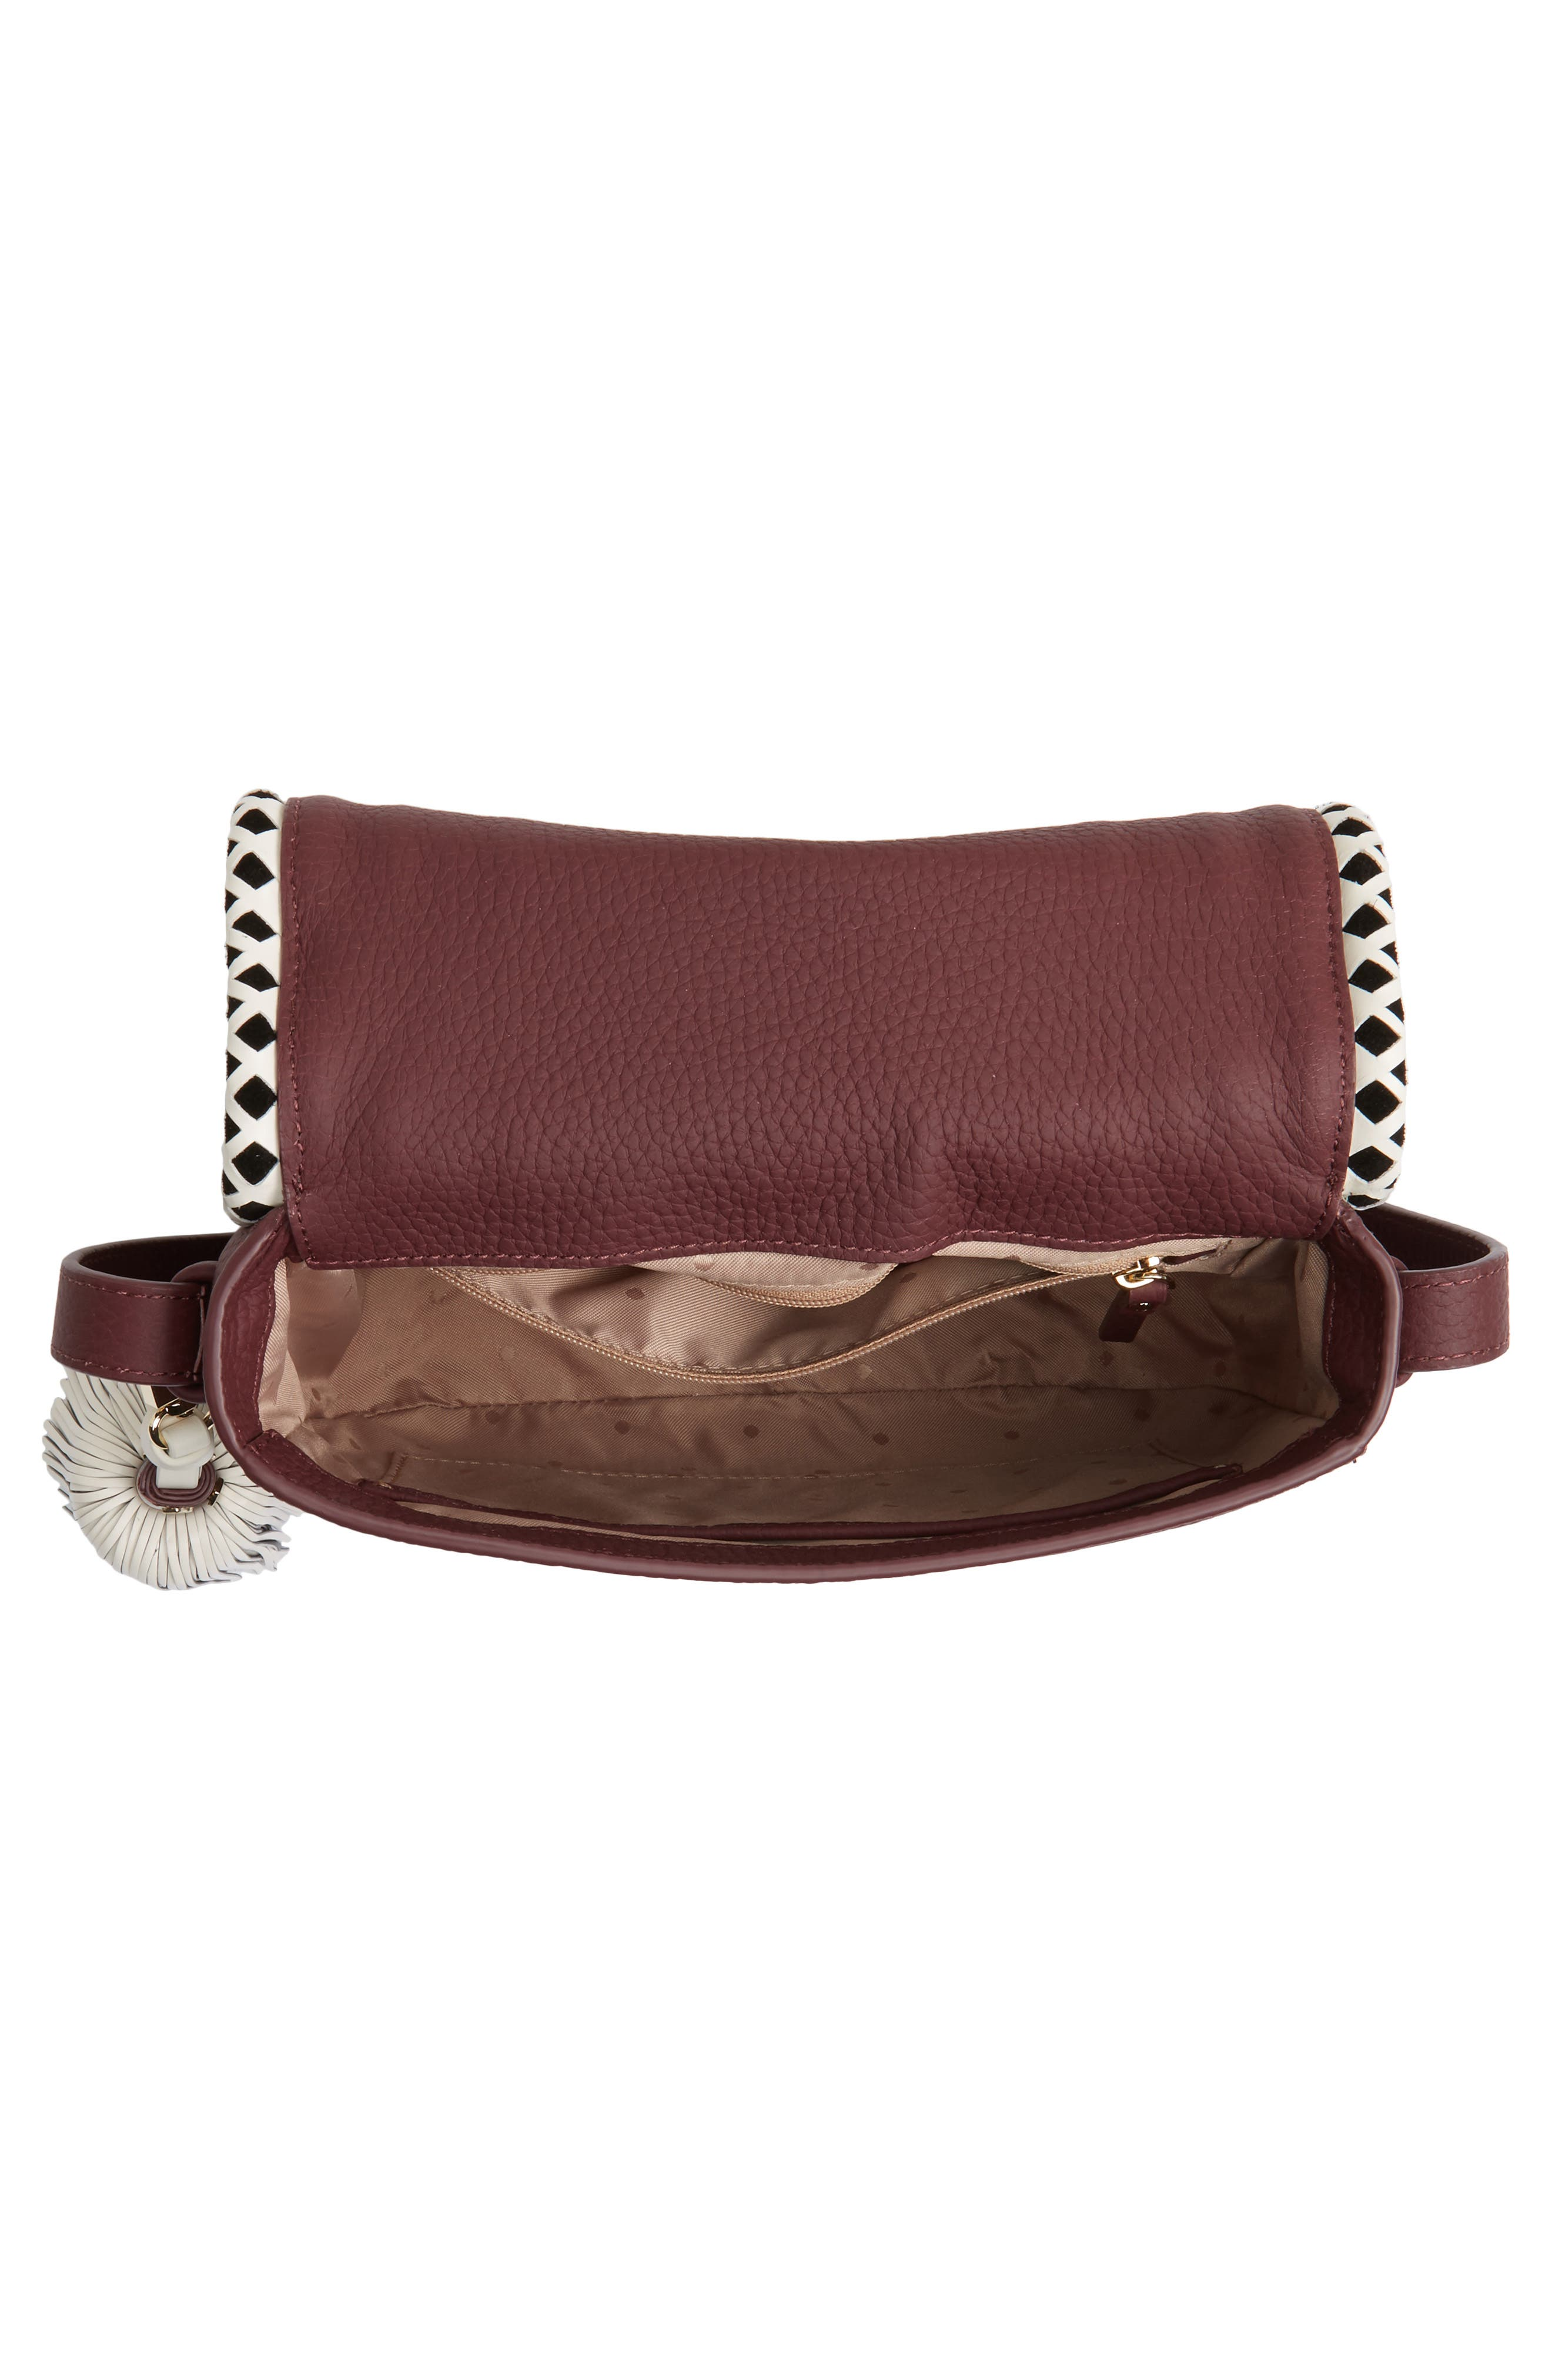 crown street - jasper leather saddle bag,                             Alternate thumbnail 8, color,